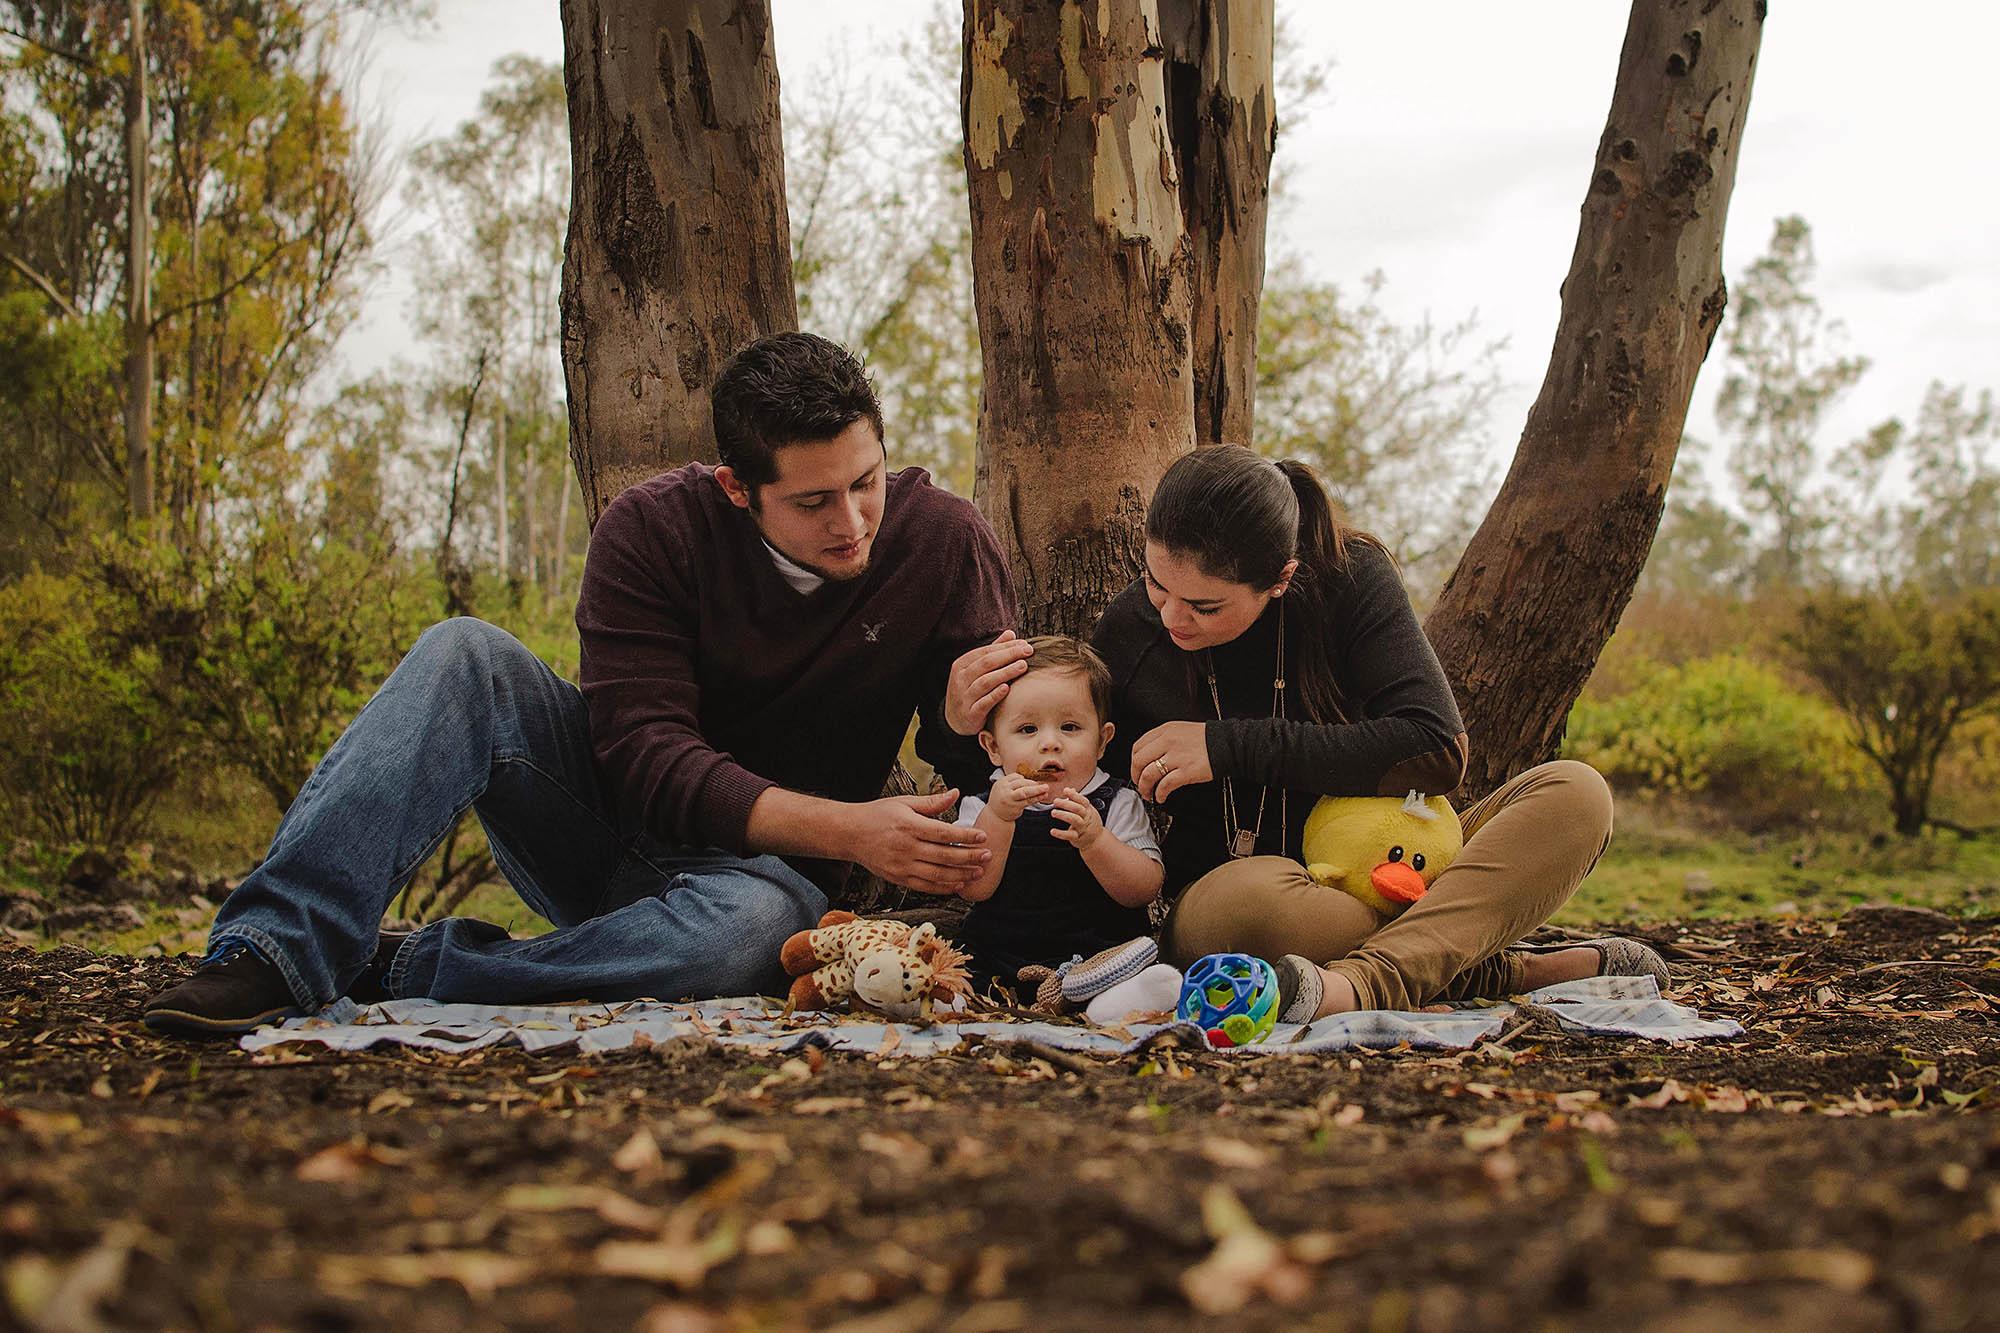 fotografo-de-familia-Queretaro-Emiliano-8.jpg